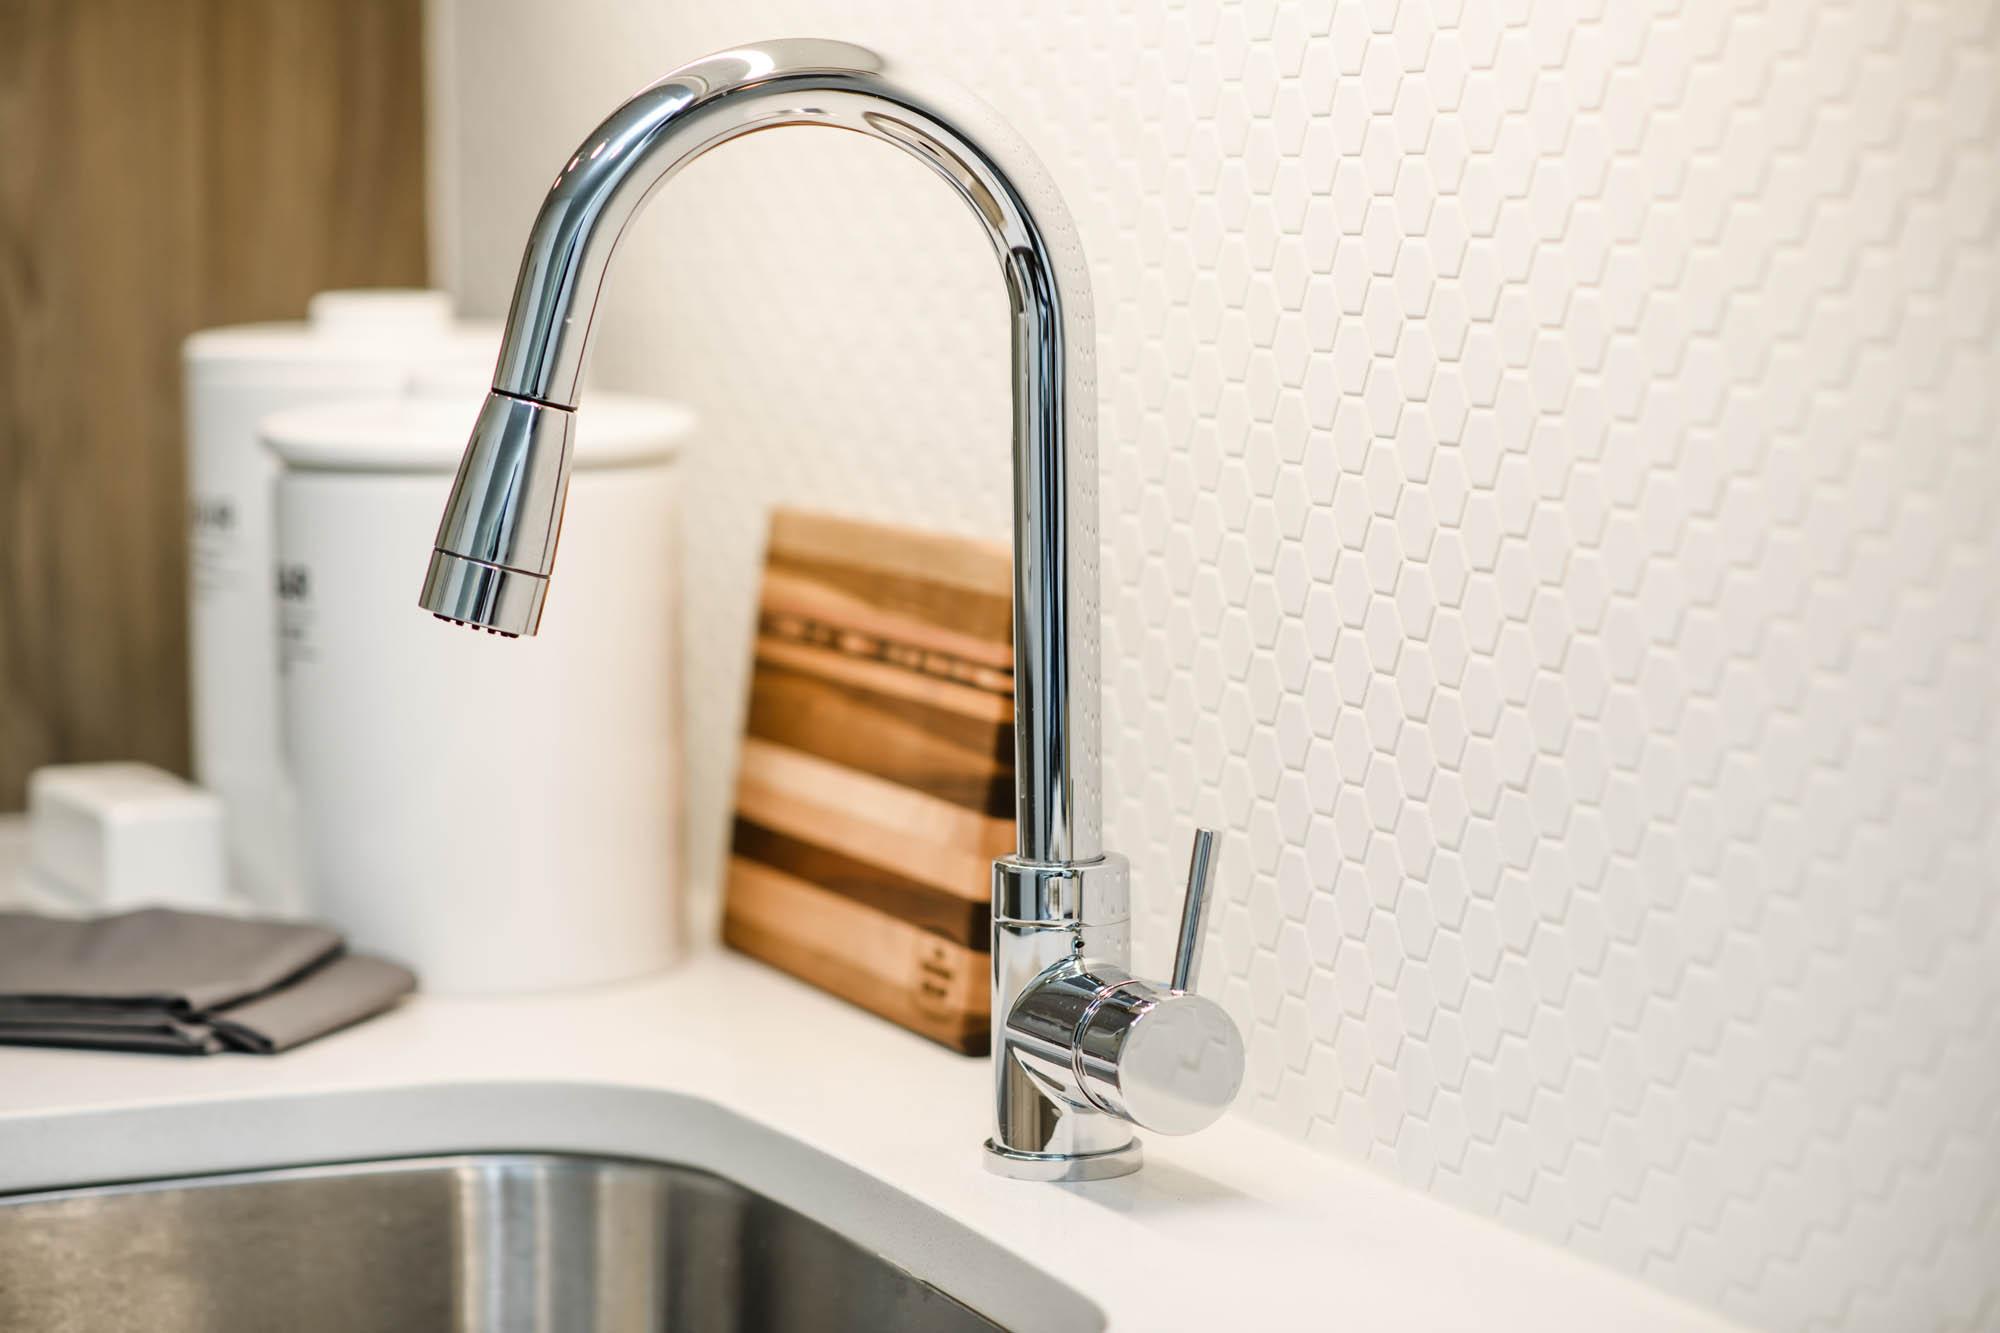 Energy saving water and light fixtures